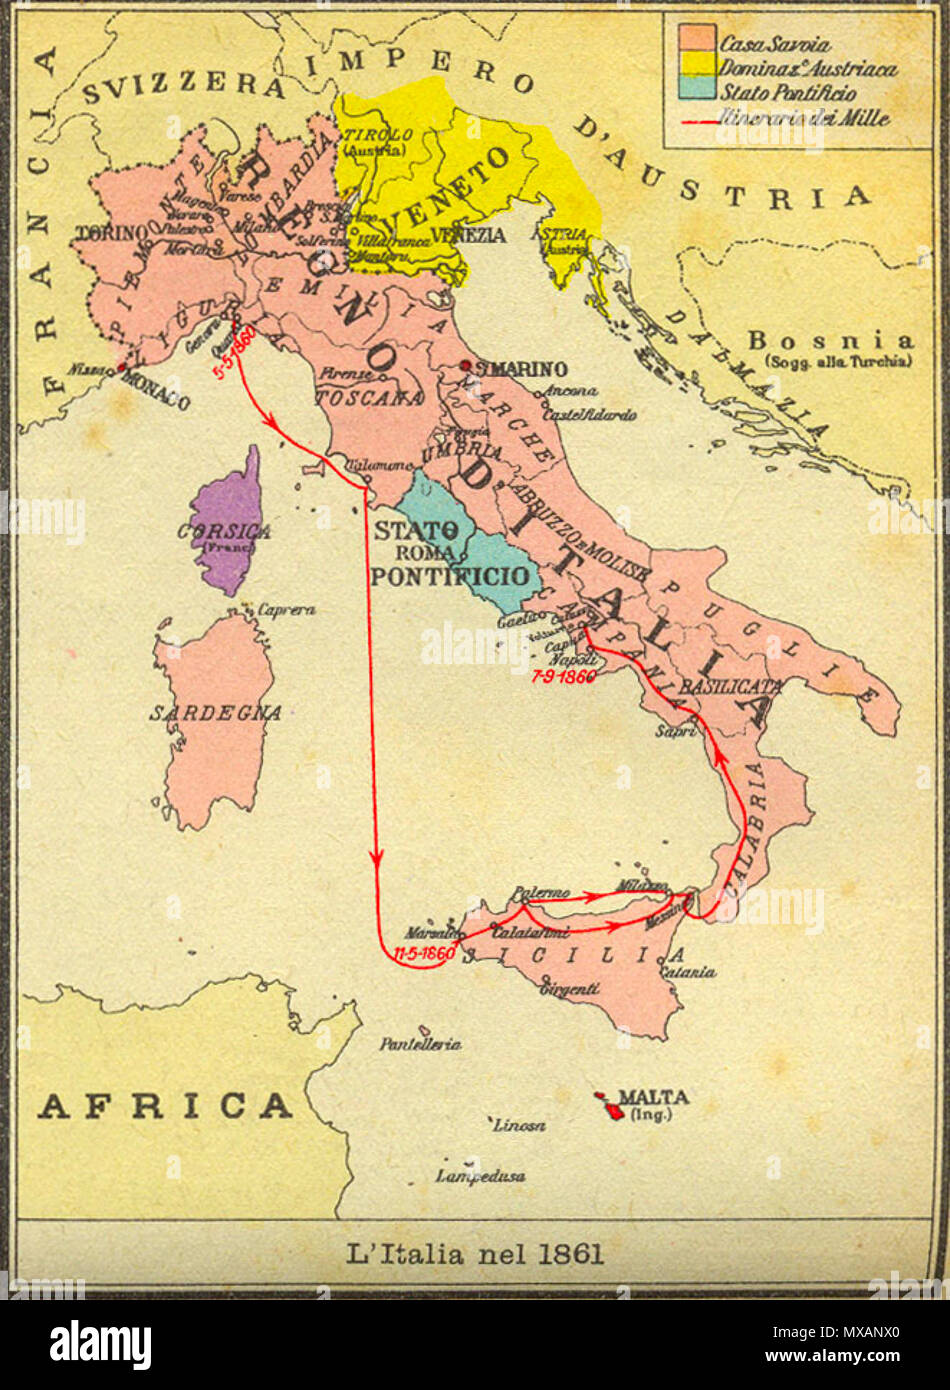 Cartina Italia In Inglese.Inglese Italia 1861 Mappa Italiano Mappa D Italia Al 1861 Sconosciuto 302 Italia Al 1861 Foto Stock Alamy